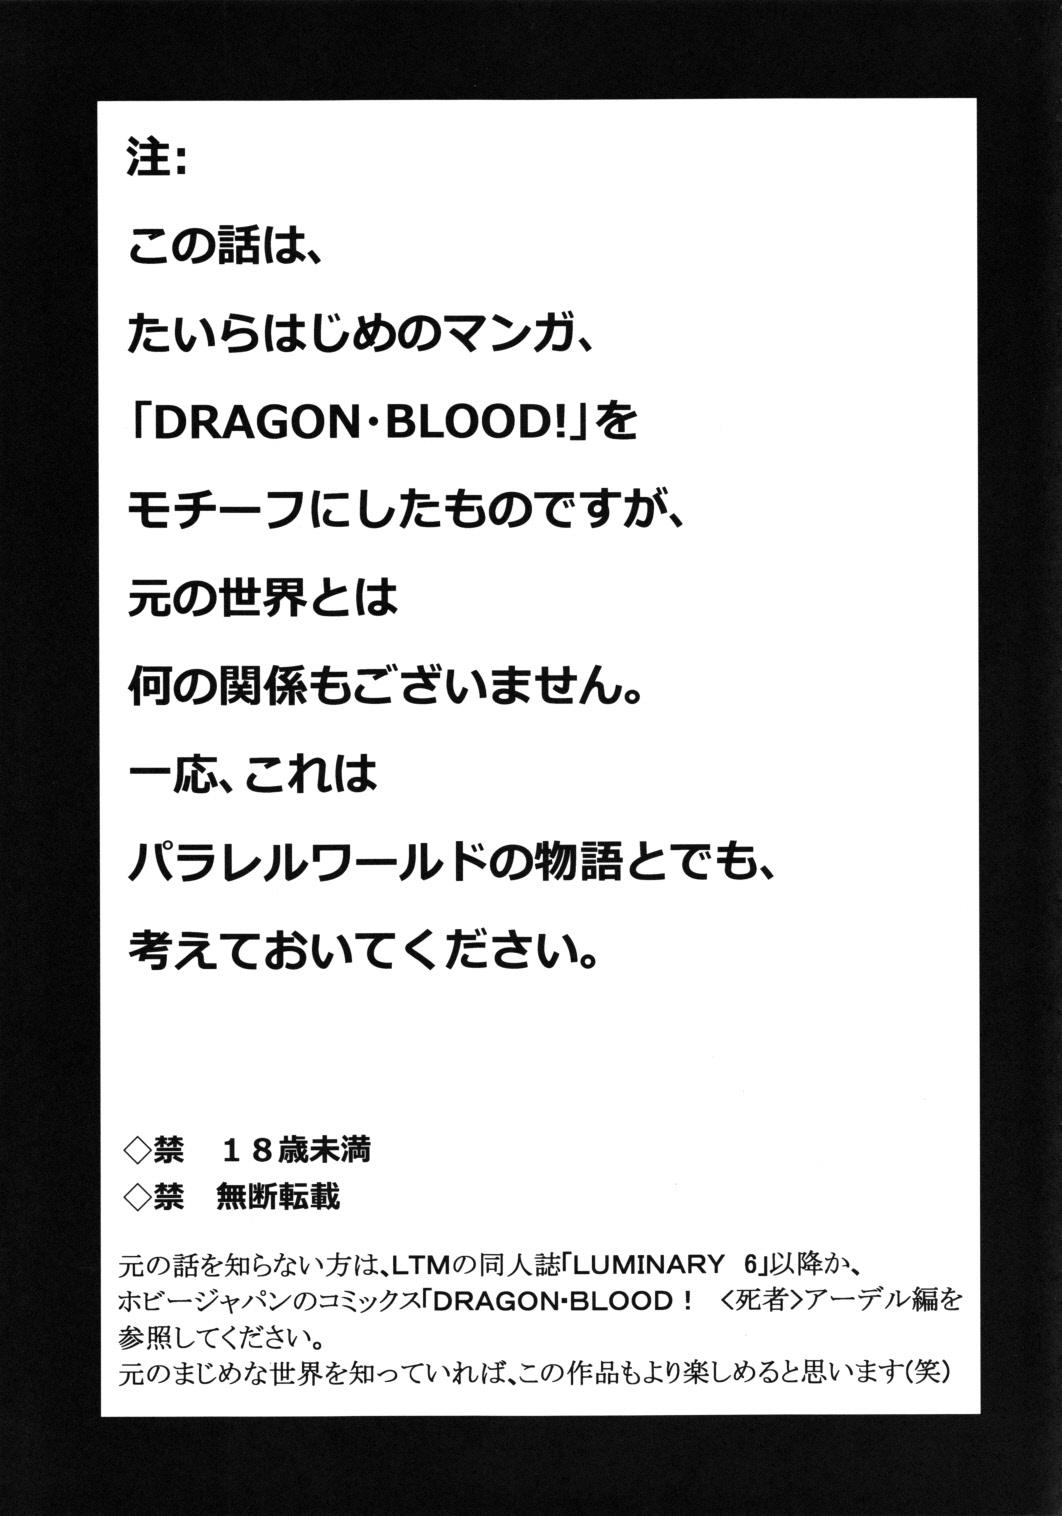 Nise DRAGON BLOOD! 18 1/2 3